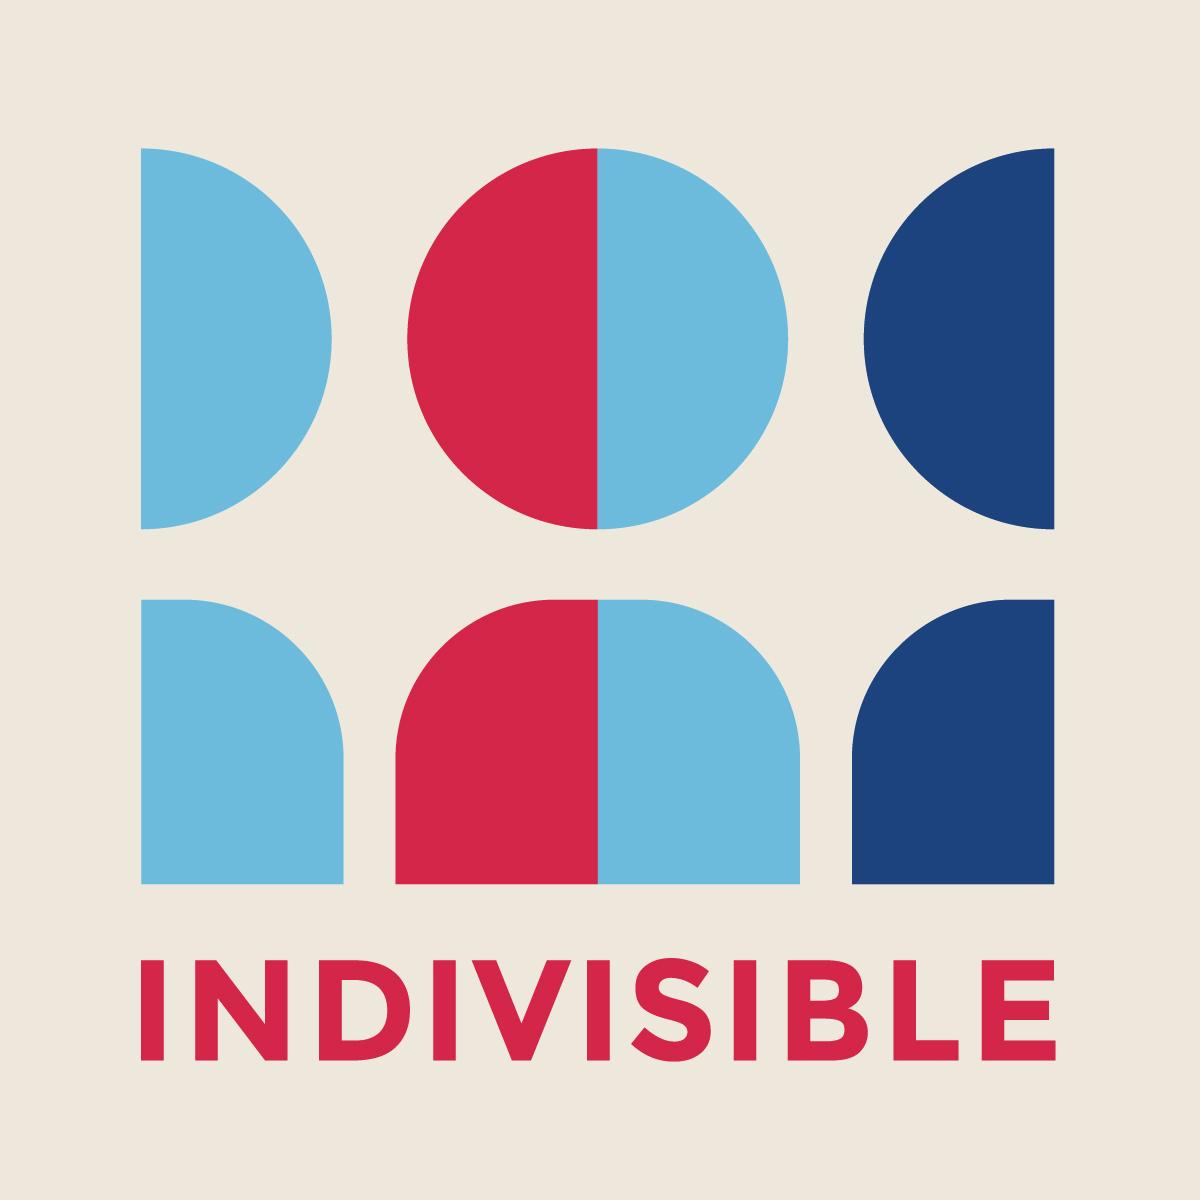 Indivisible_logo_square_cream_w_wordmark-01.jpg